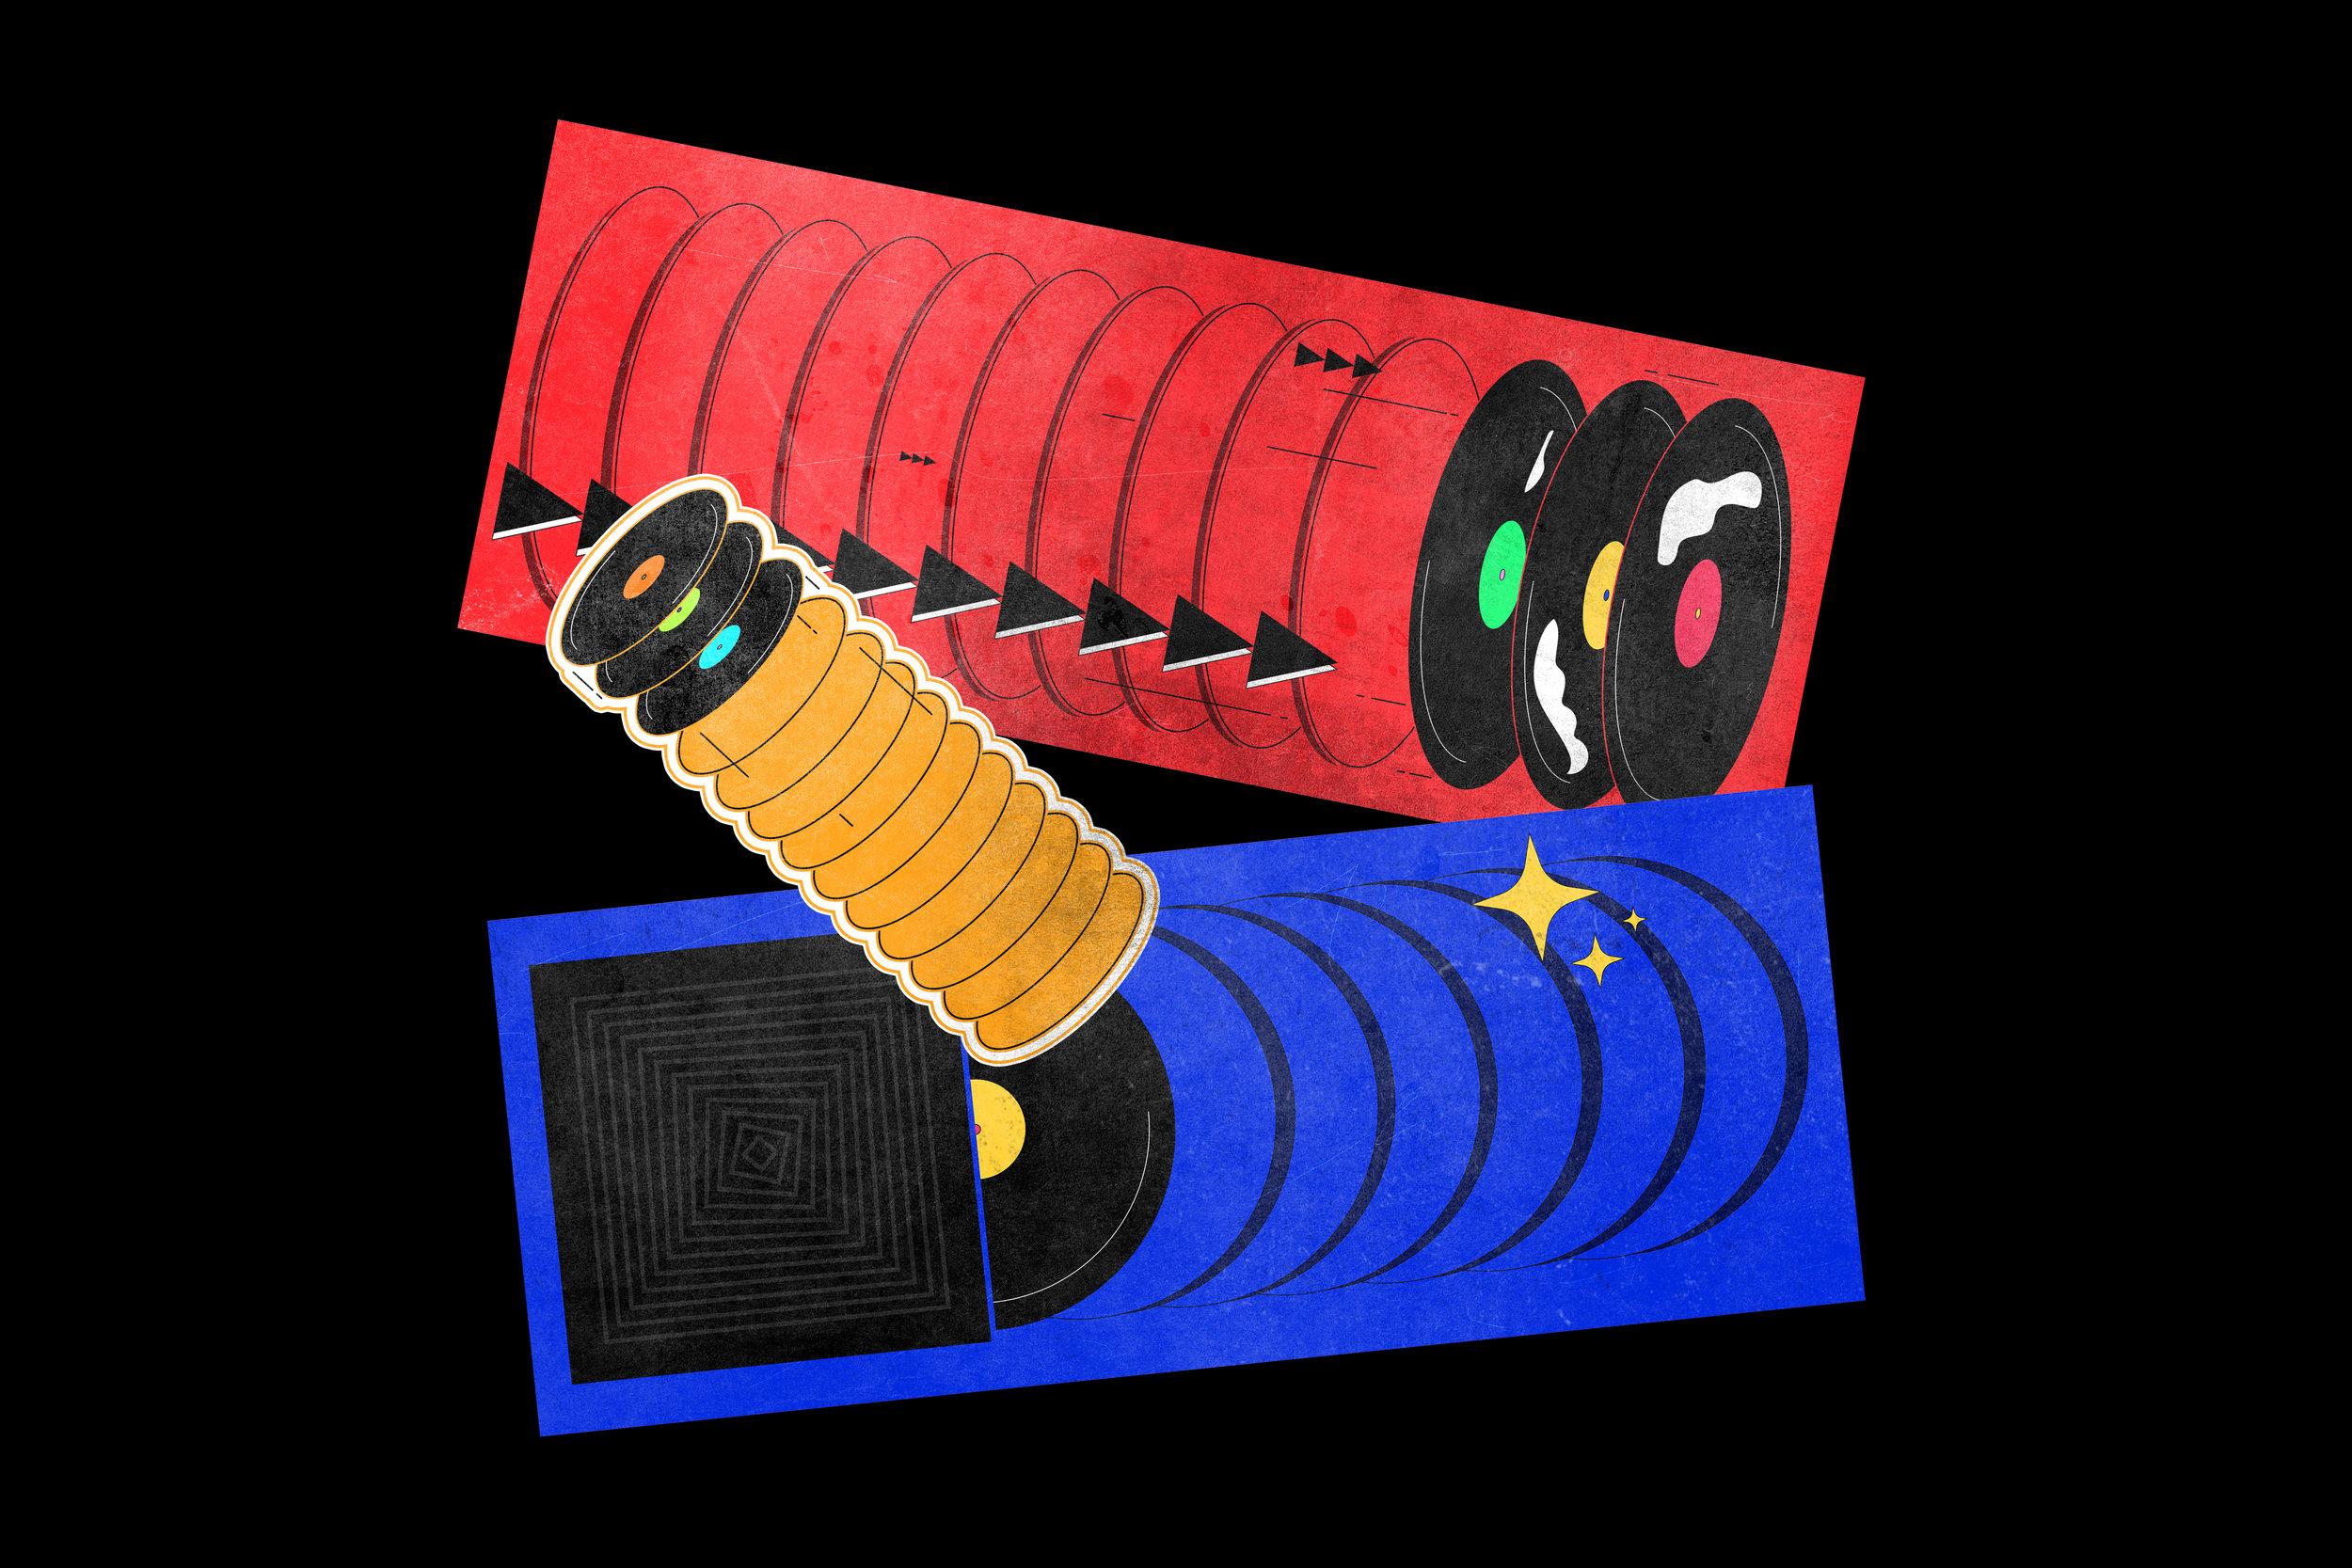 Illustration designed for The Vinyl Factory